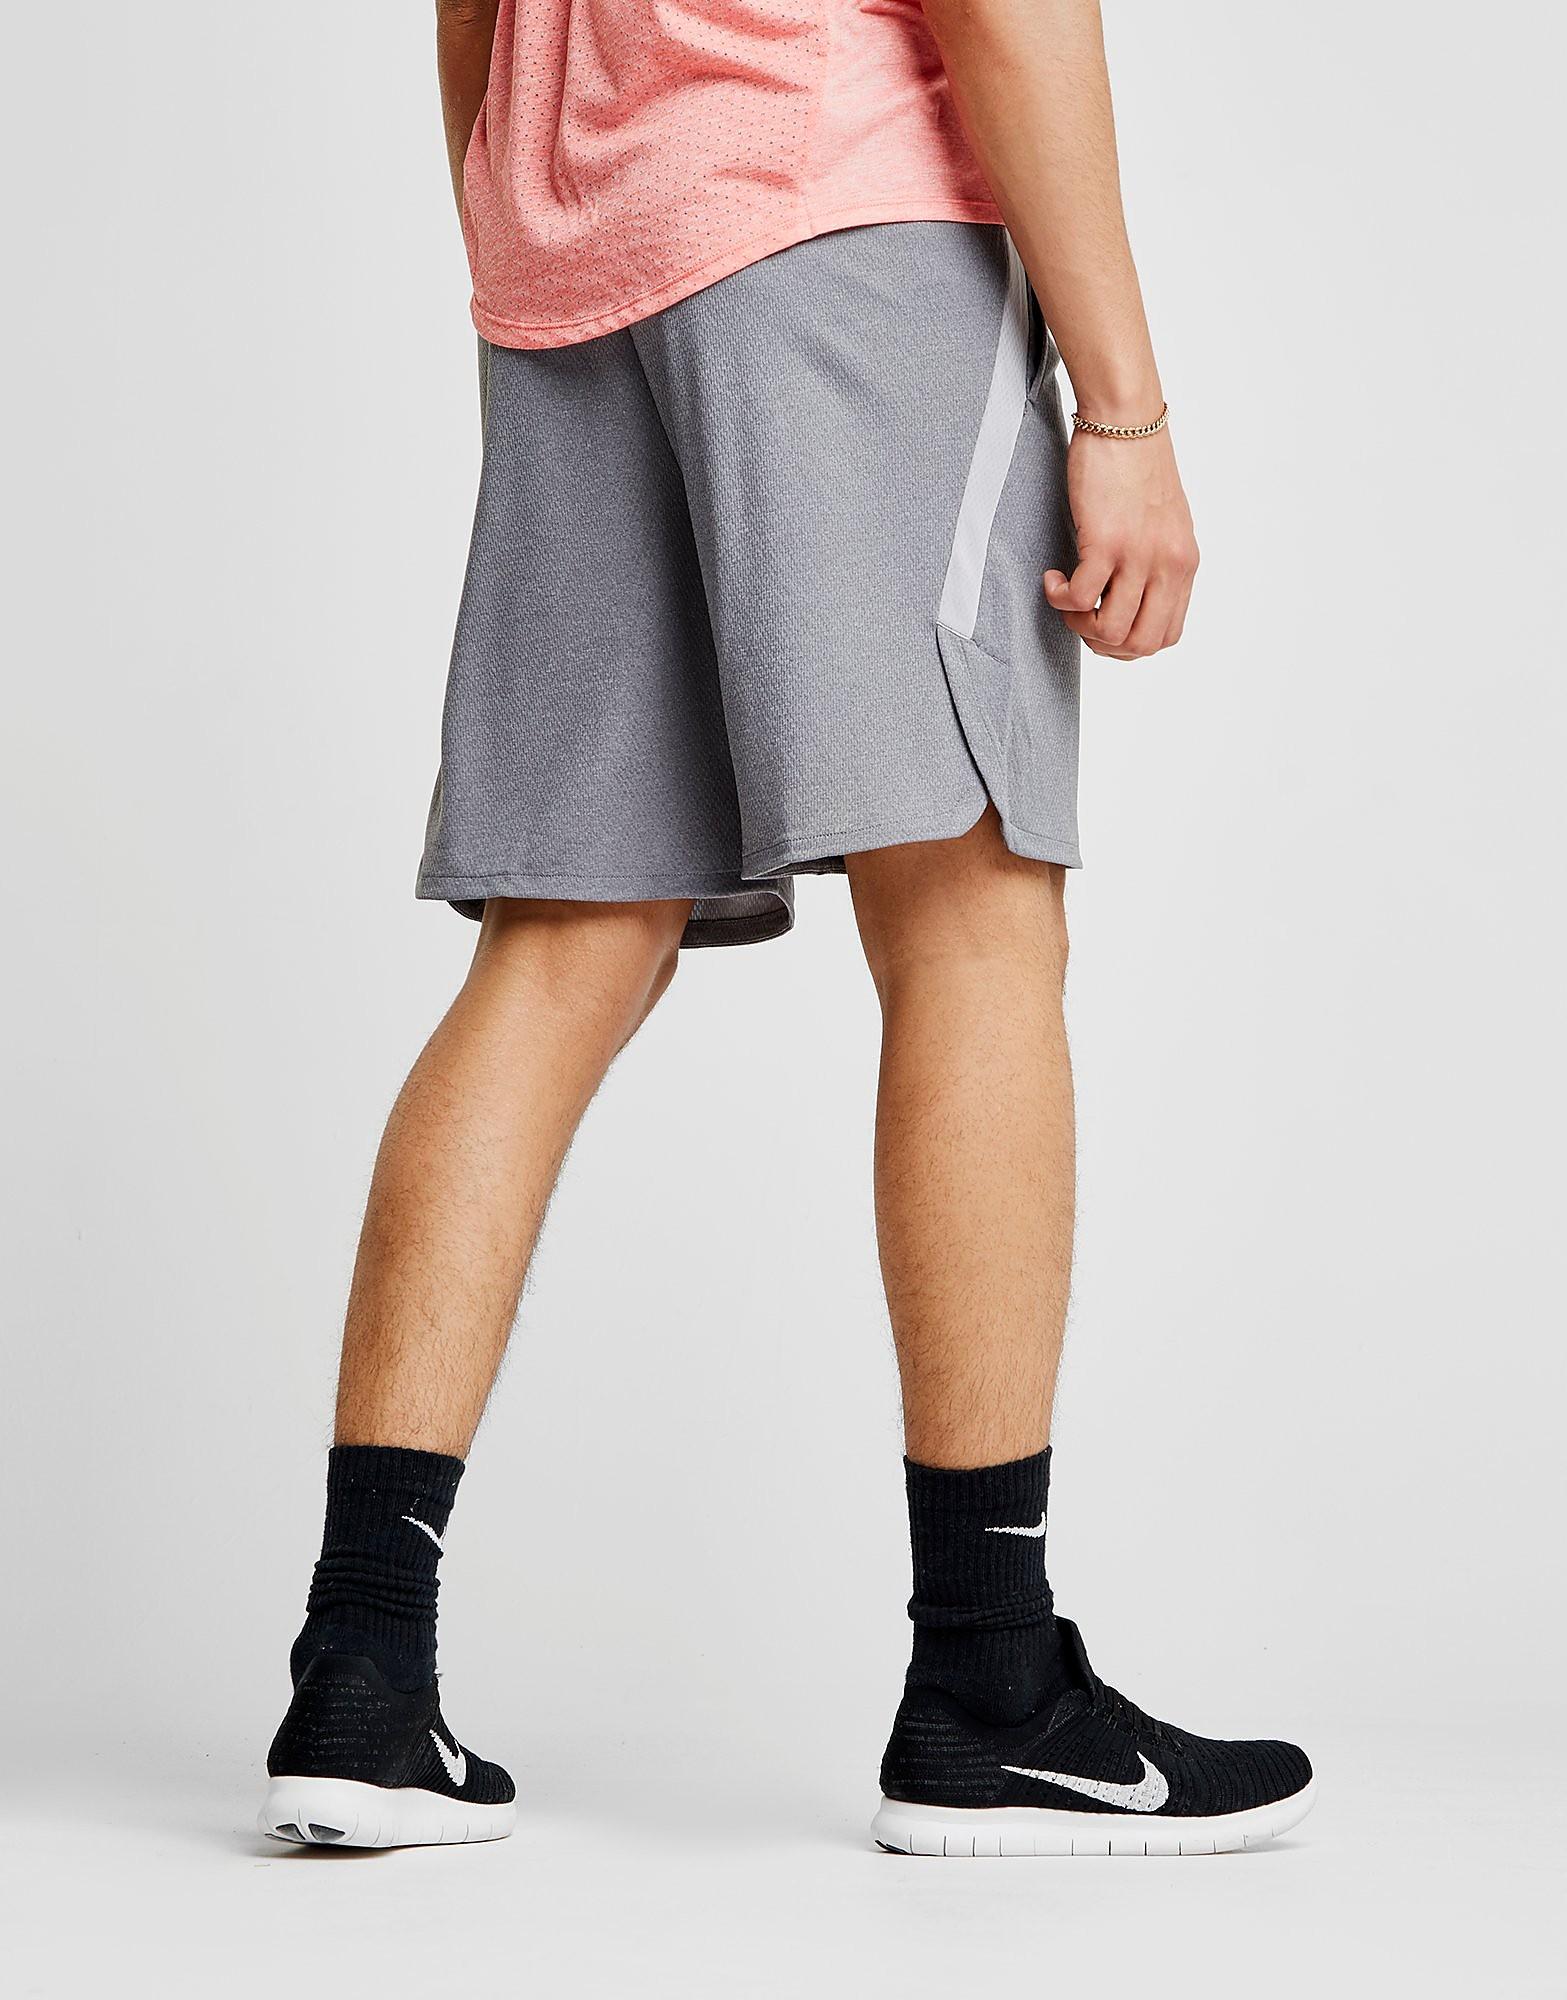 Nike Dry Poly Shorts 4.0